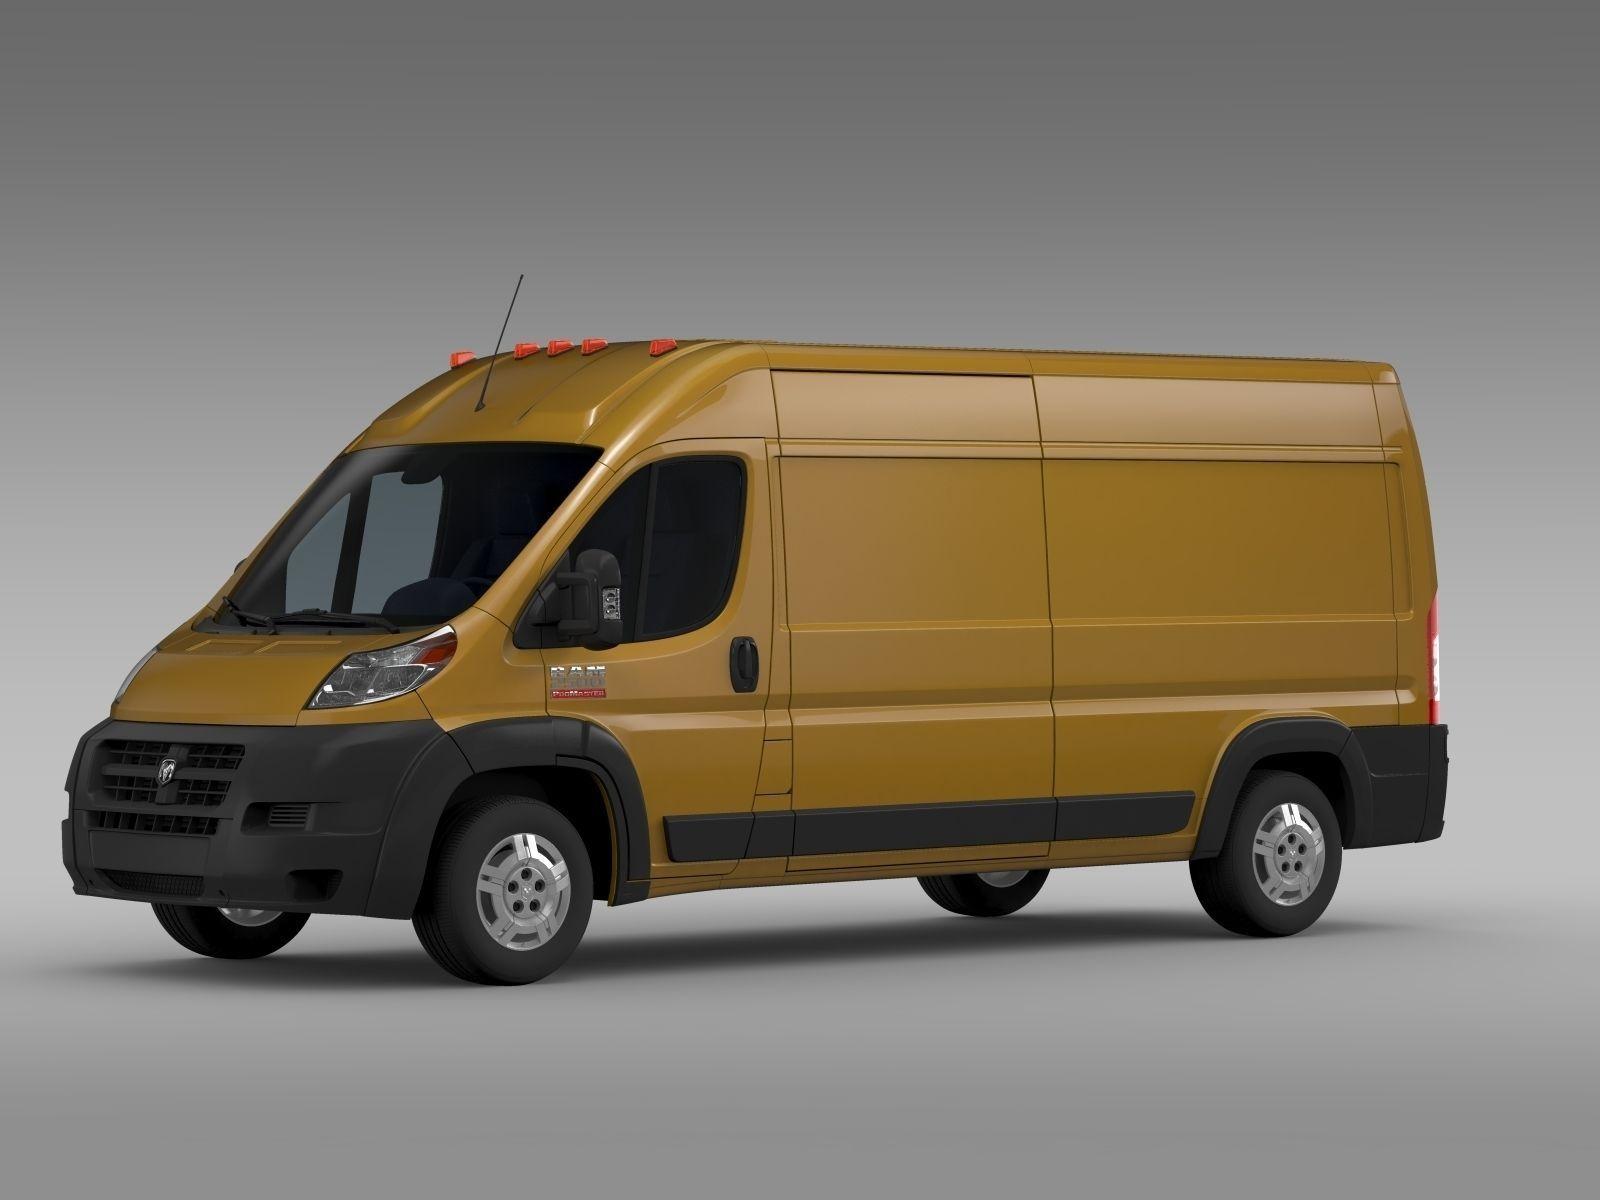 ram promaster cargo 2500 hr 159wb 2015 3d model max obj 3ds fbx c4d lwo lw lws. Black Bedroom Furniture Sets. Home Design Ideas